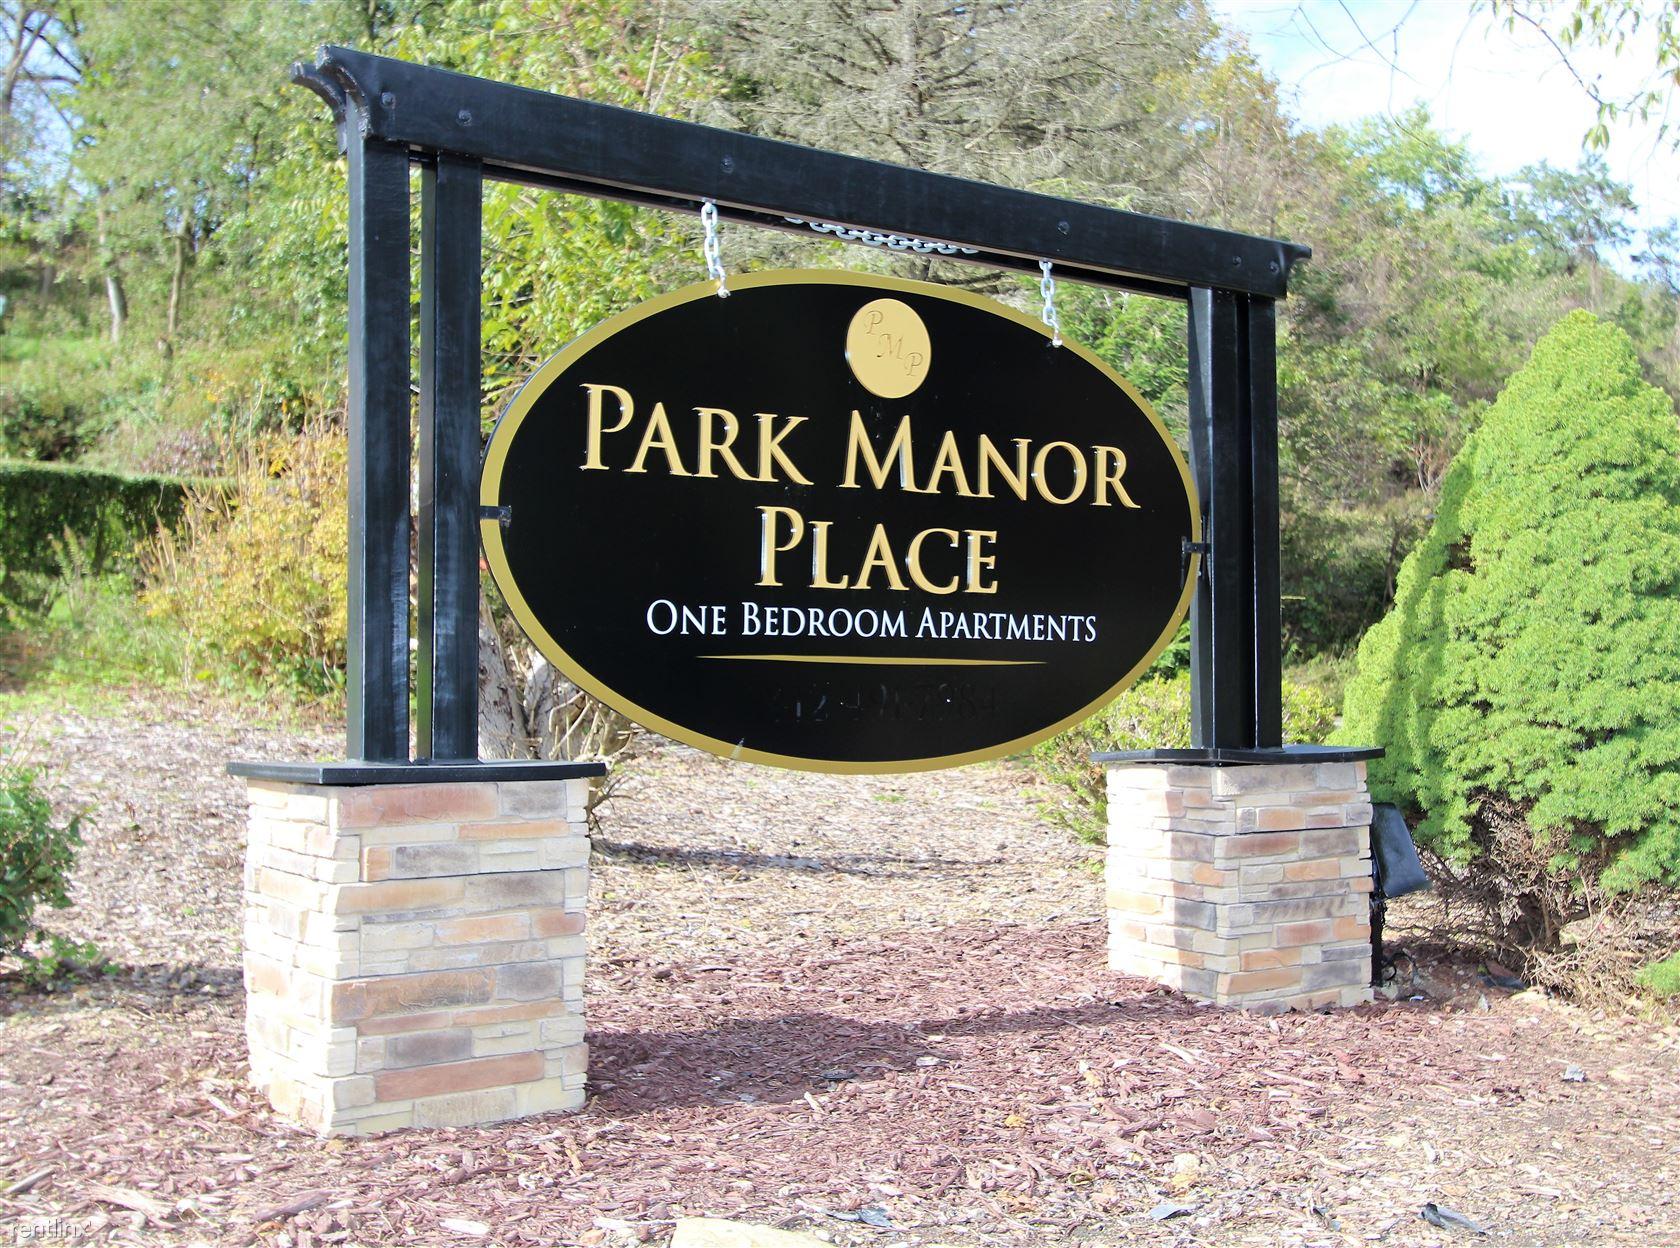 Park Manor Place